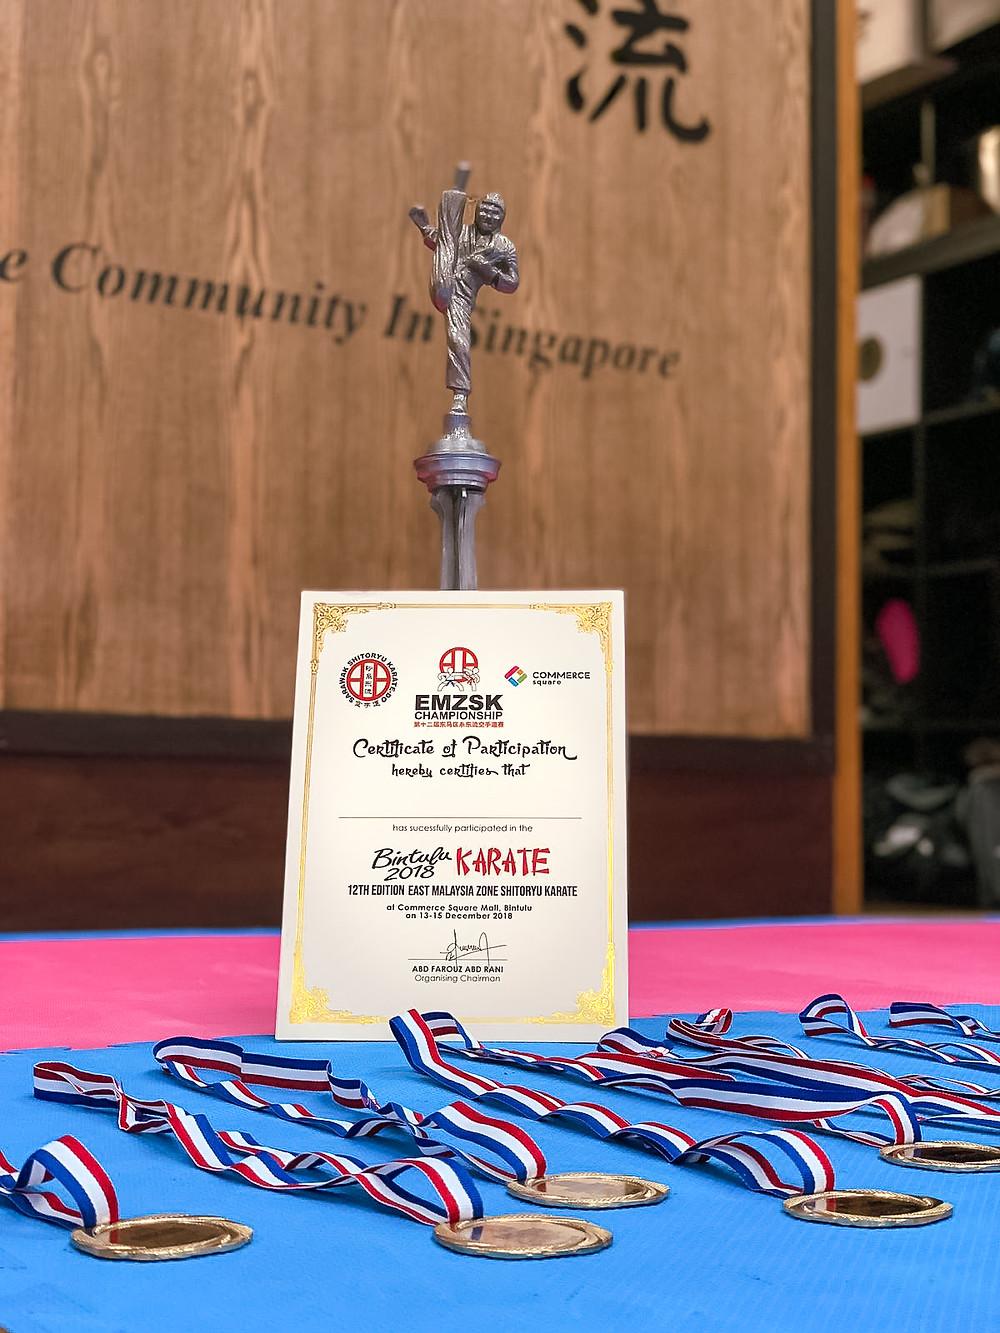 trophy, medals, certificate, gold